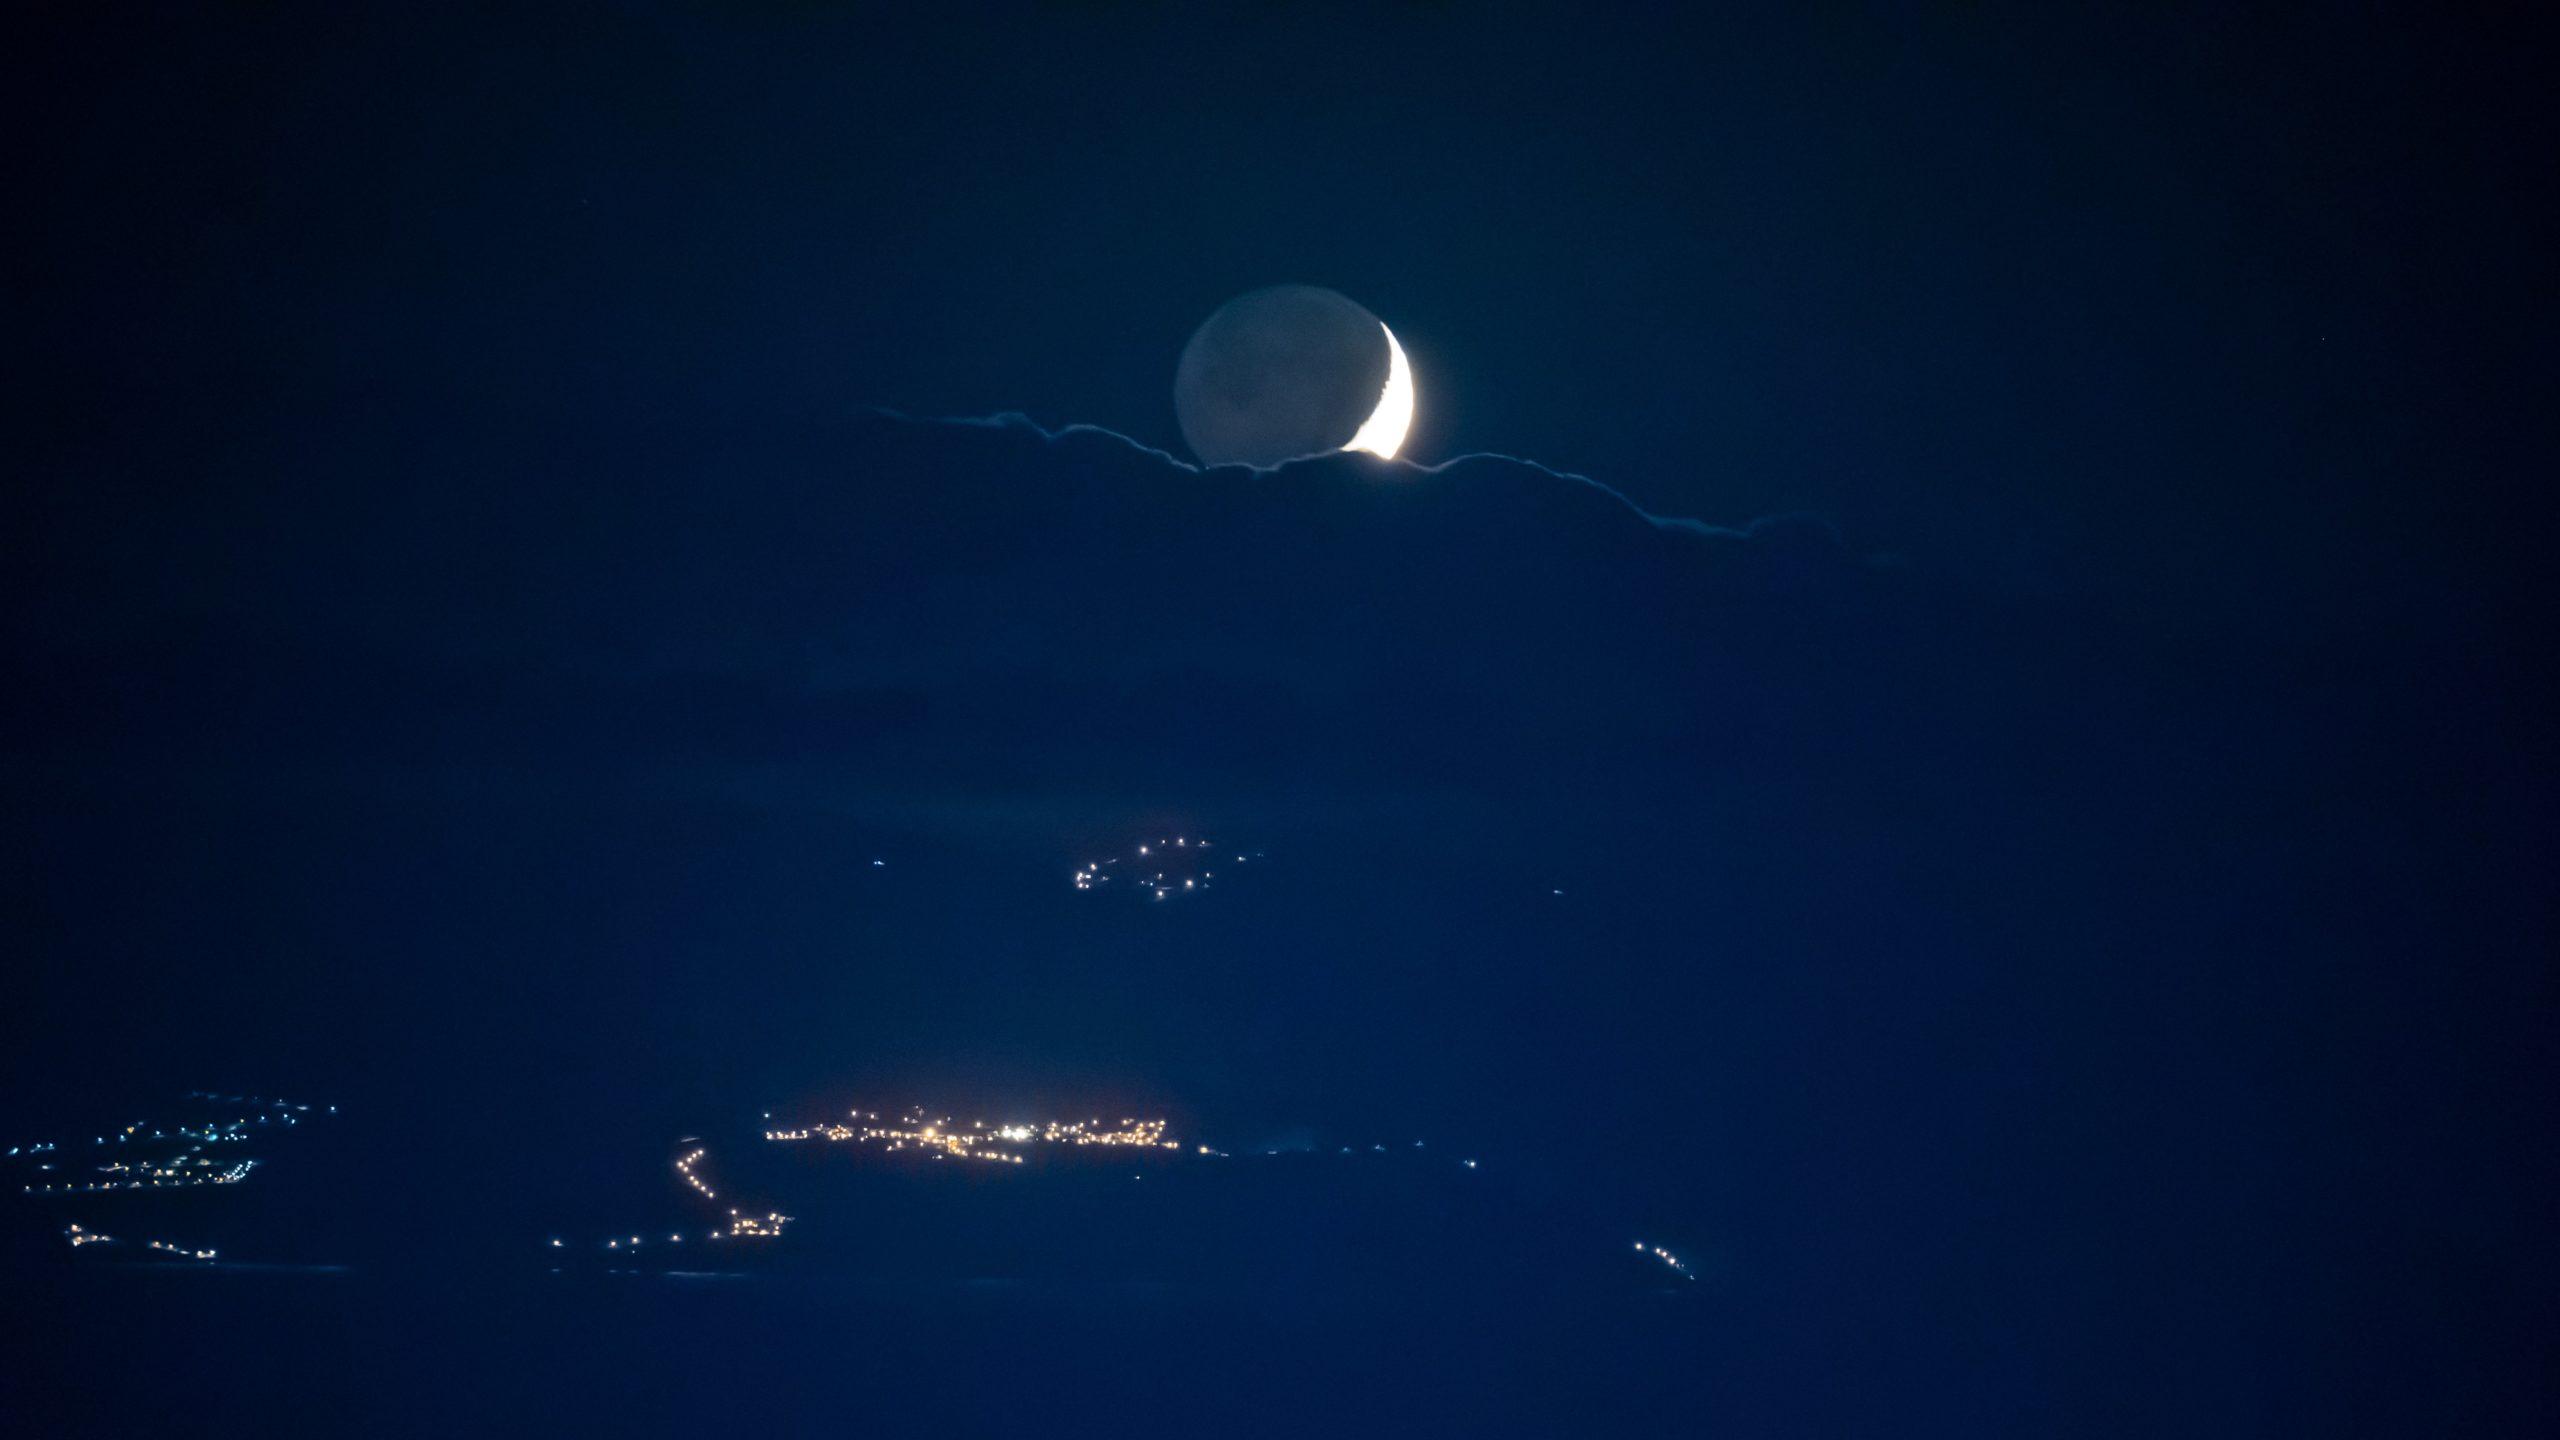 Atlantik, Teneriffa, untergehender Mond über La Gomera